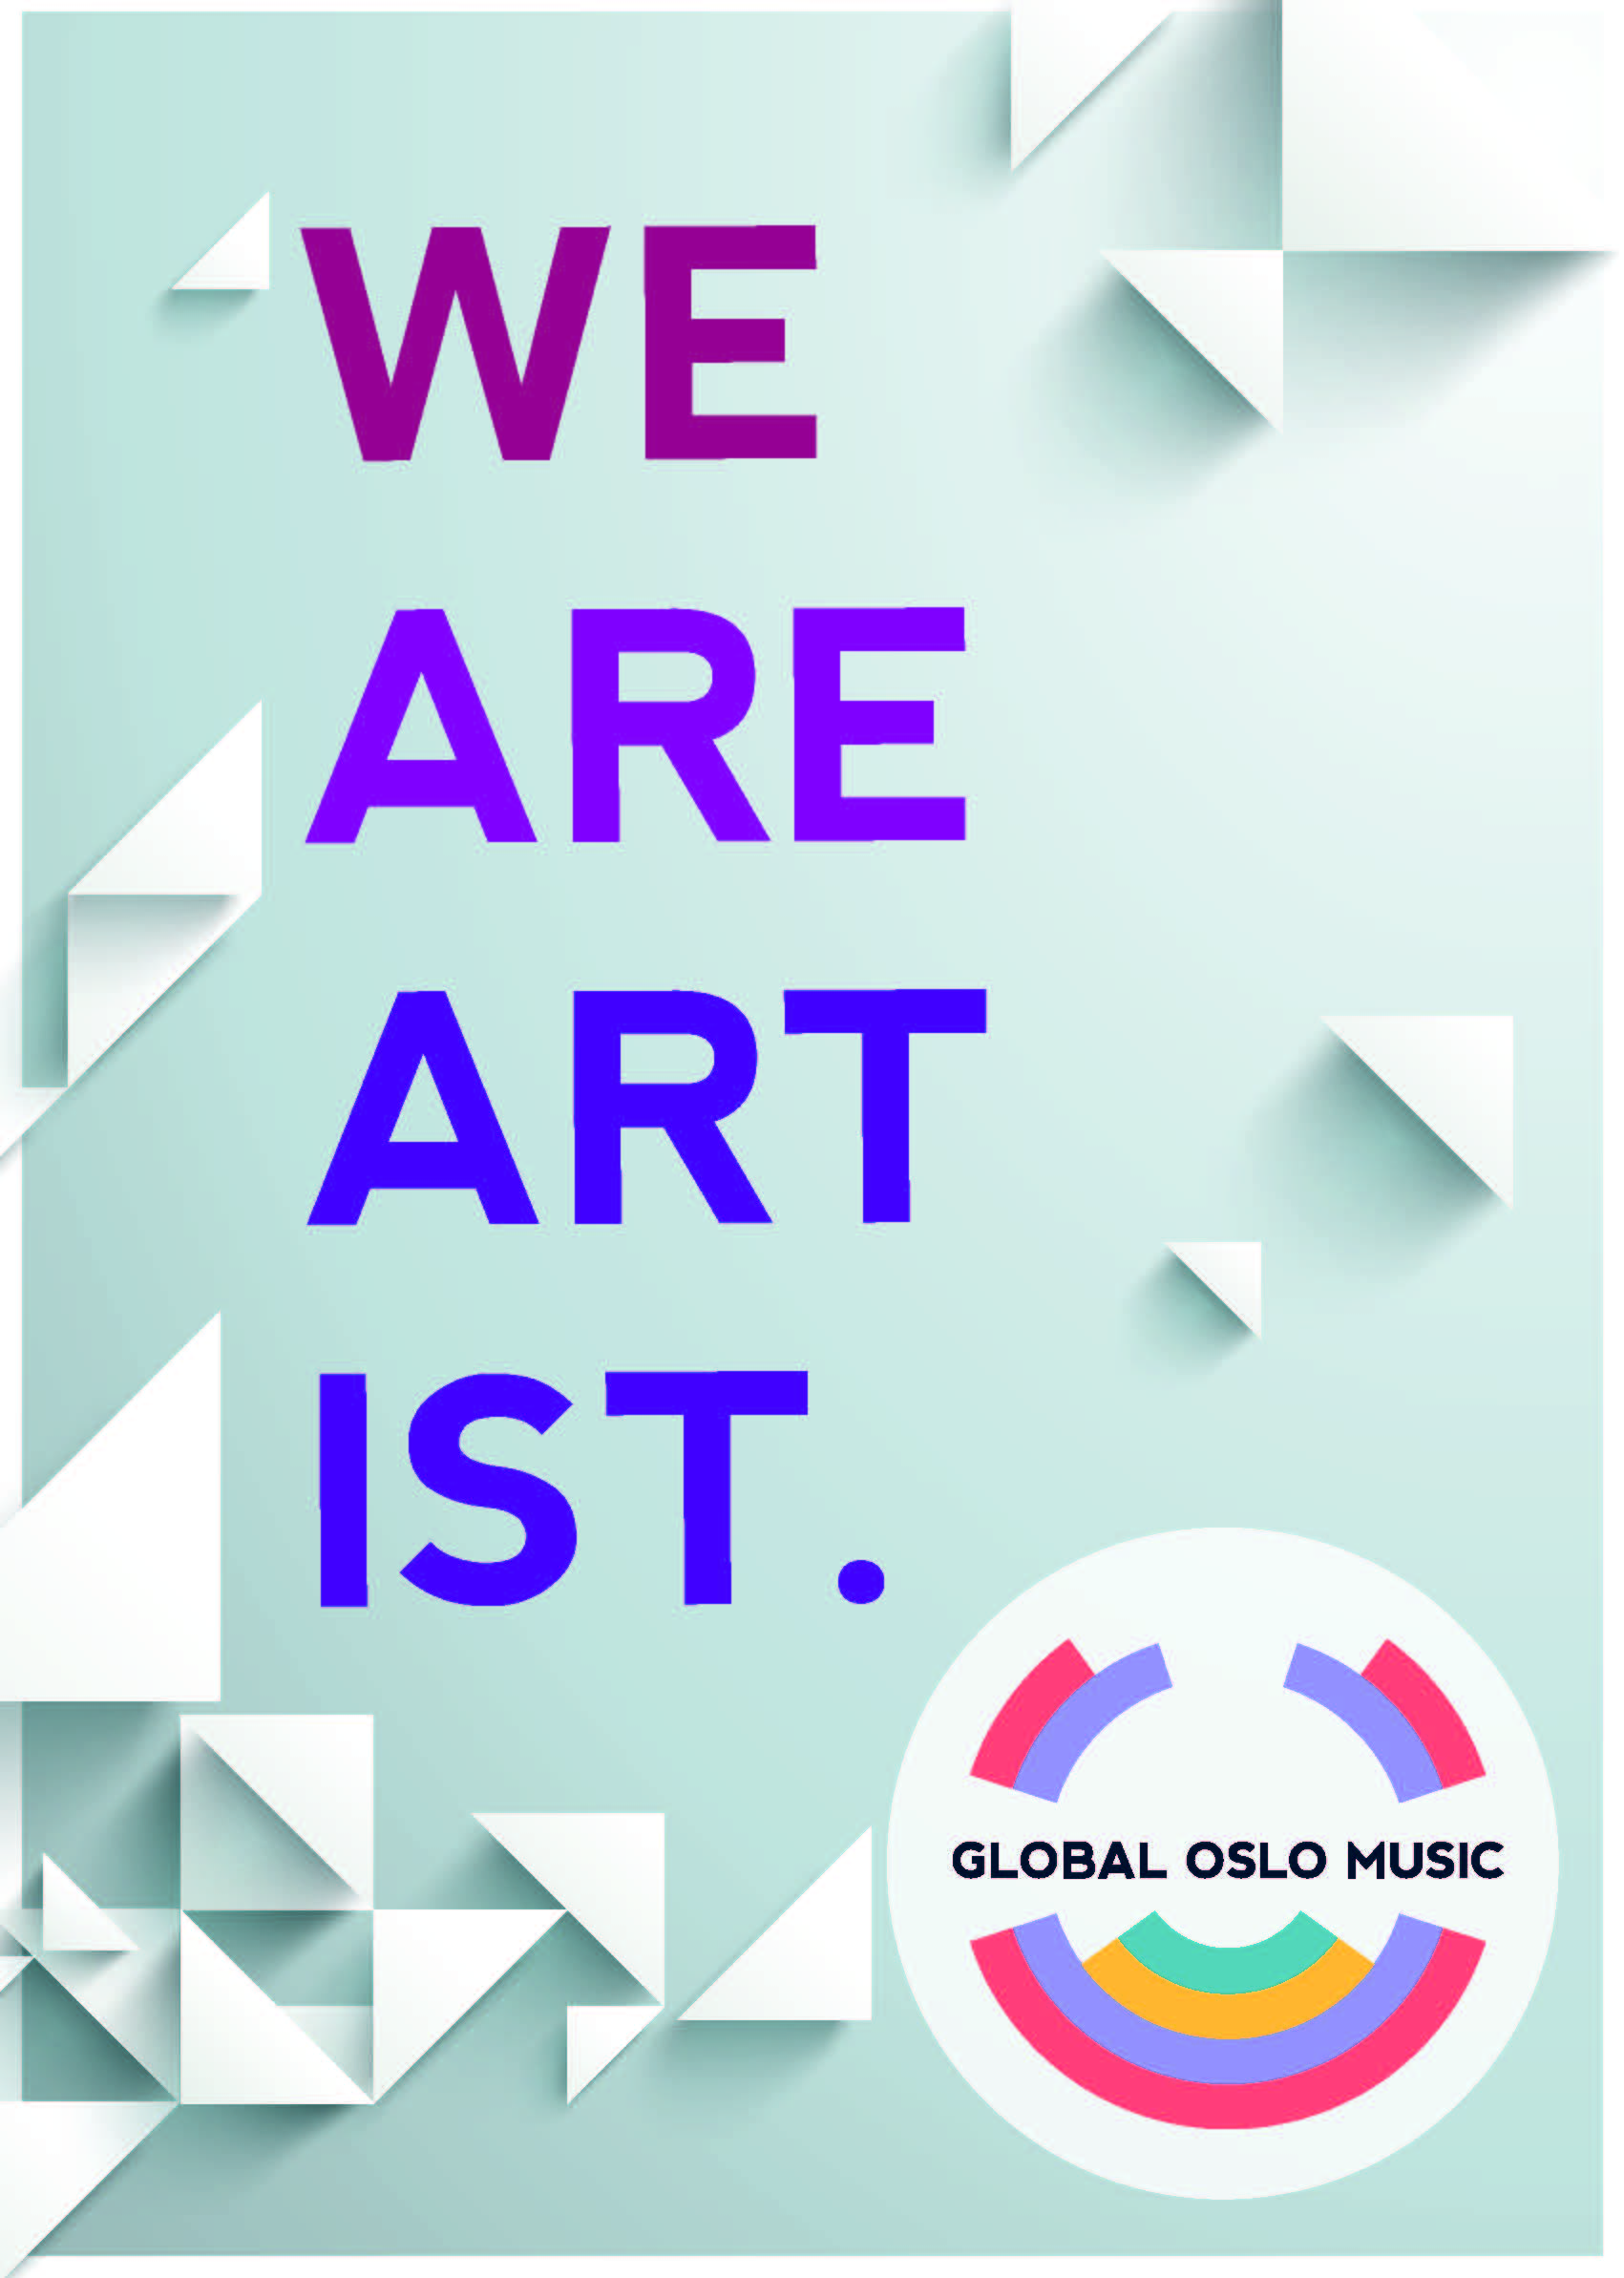 we_Are_artist_global_oslo_music